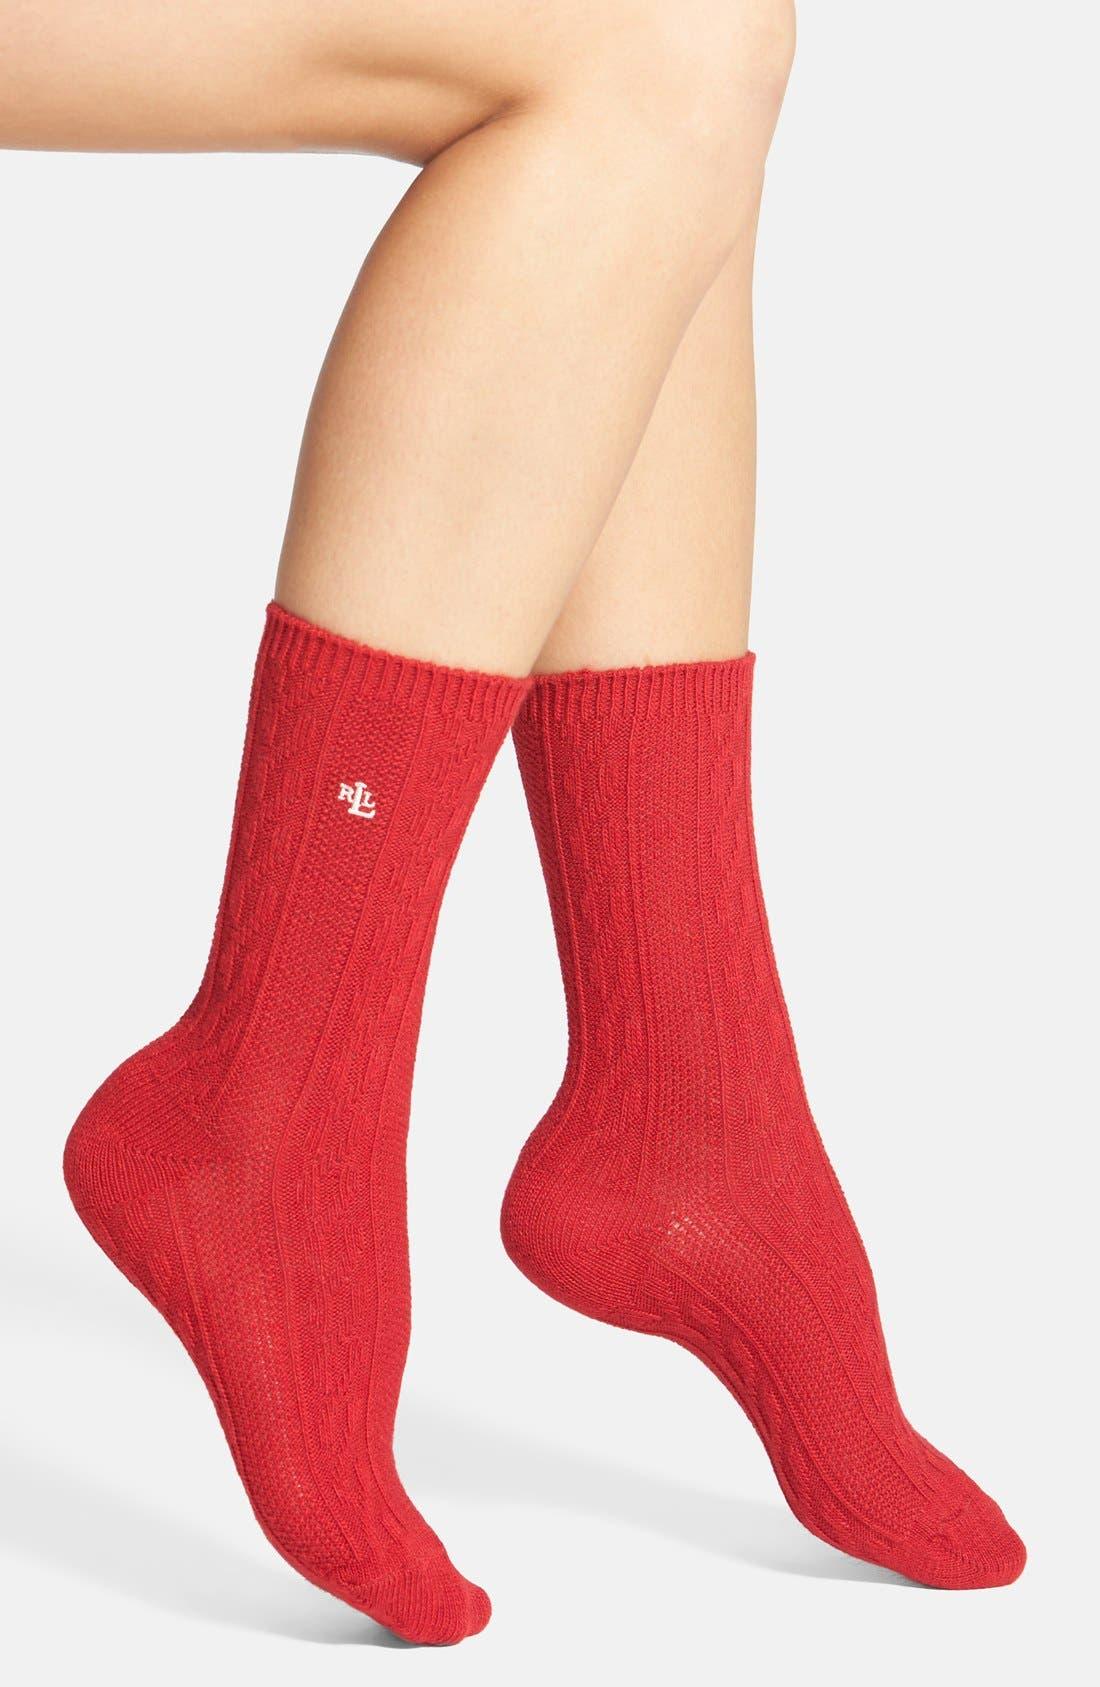 Alternate Image 1 Selected - Ralph Lauren Cable Knit Trouser Socks